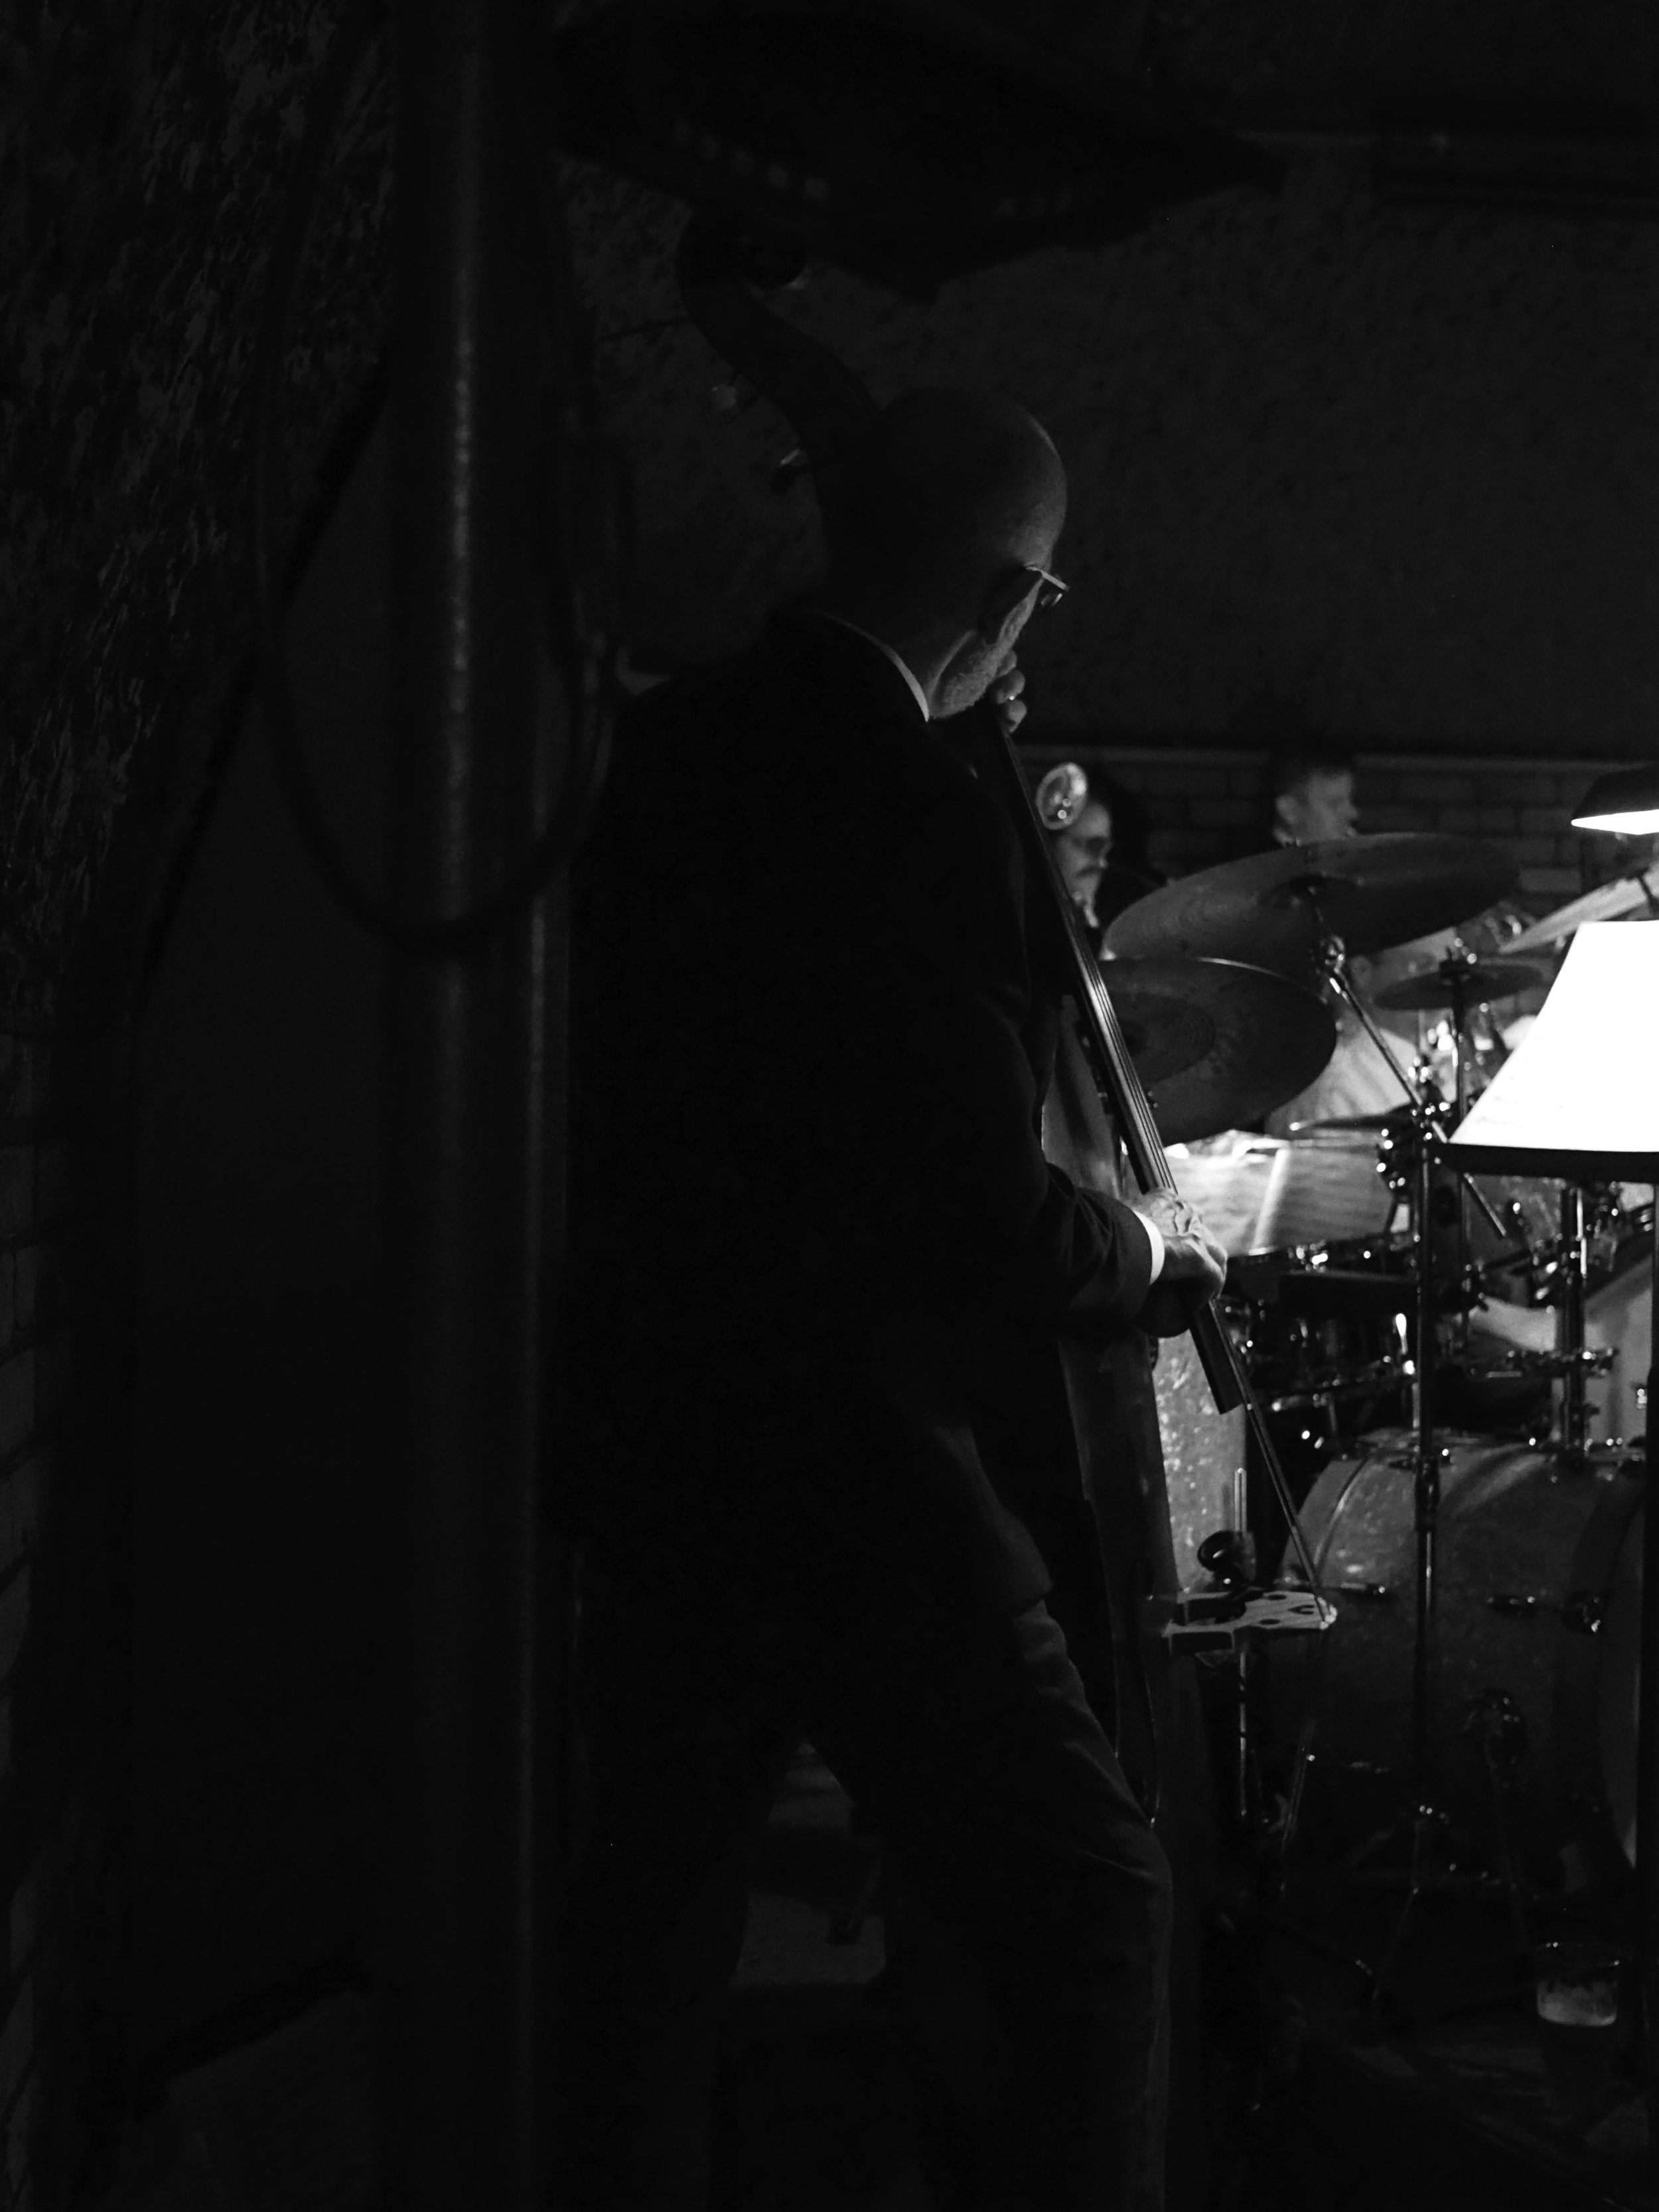 Bassist. Saint Paul, MN.